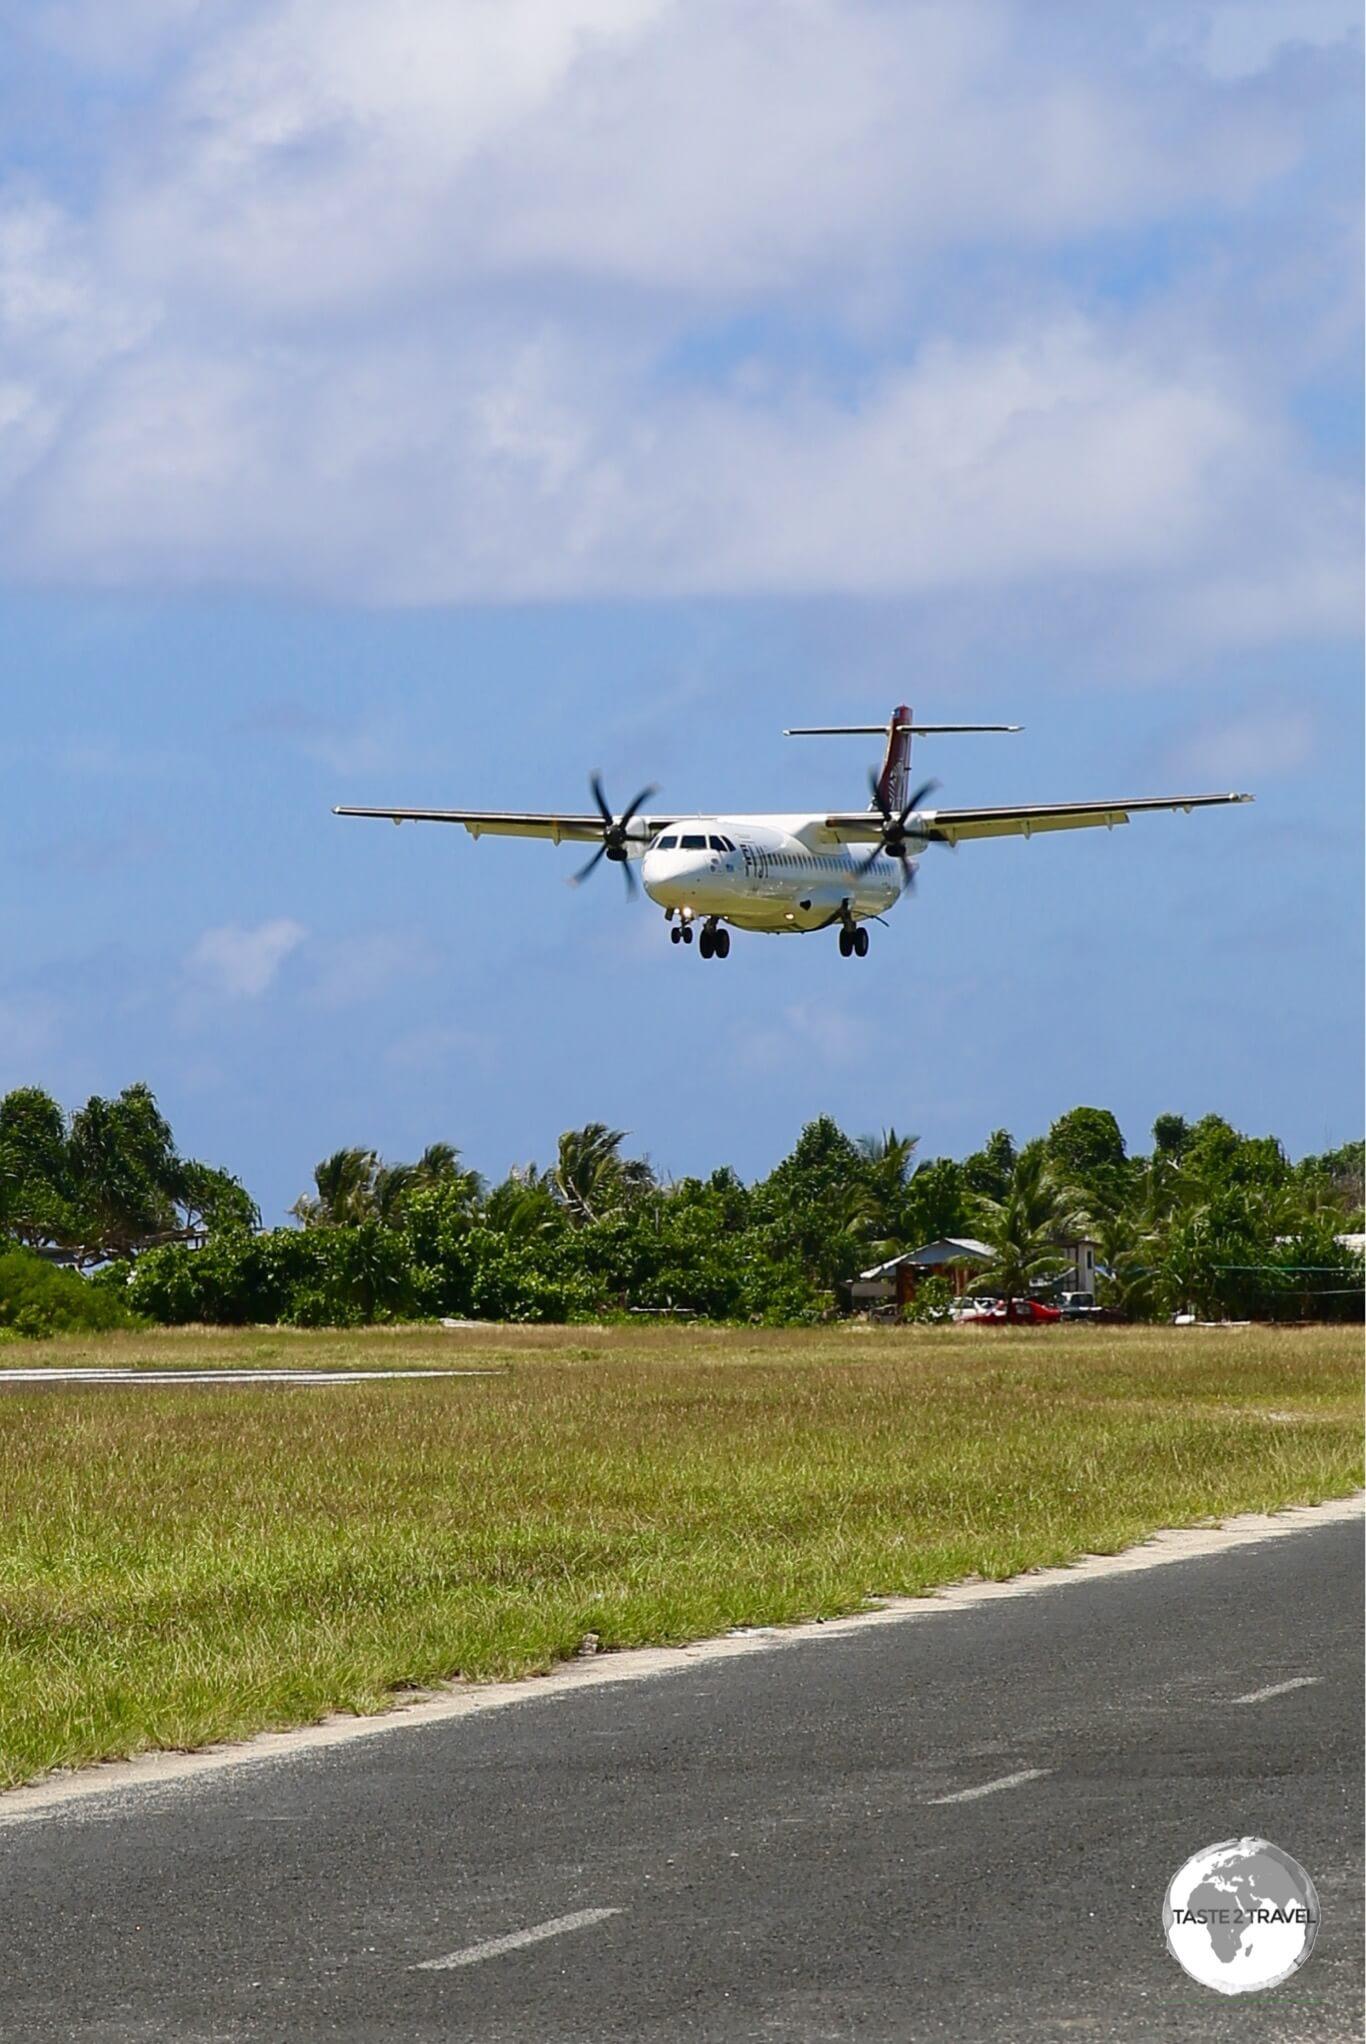 Fiji airways arriving on remote Tuvalu.